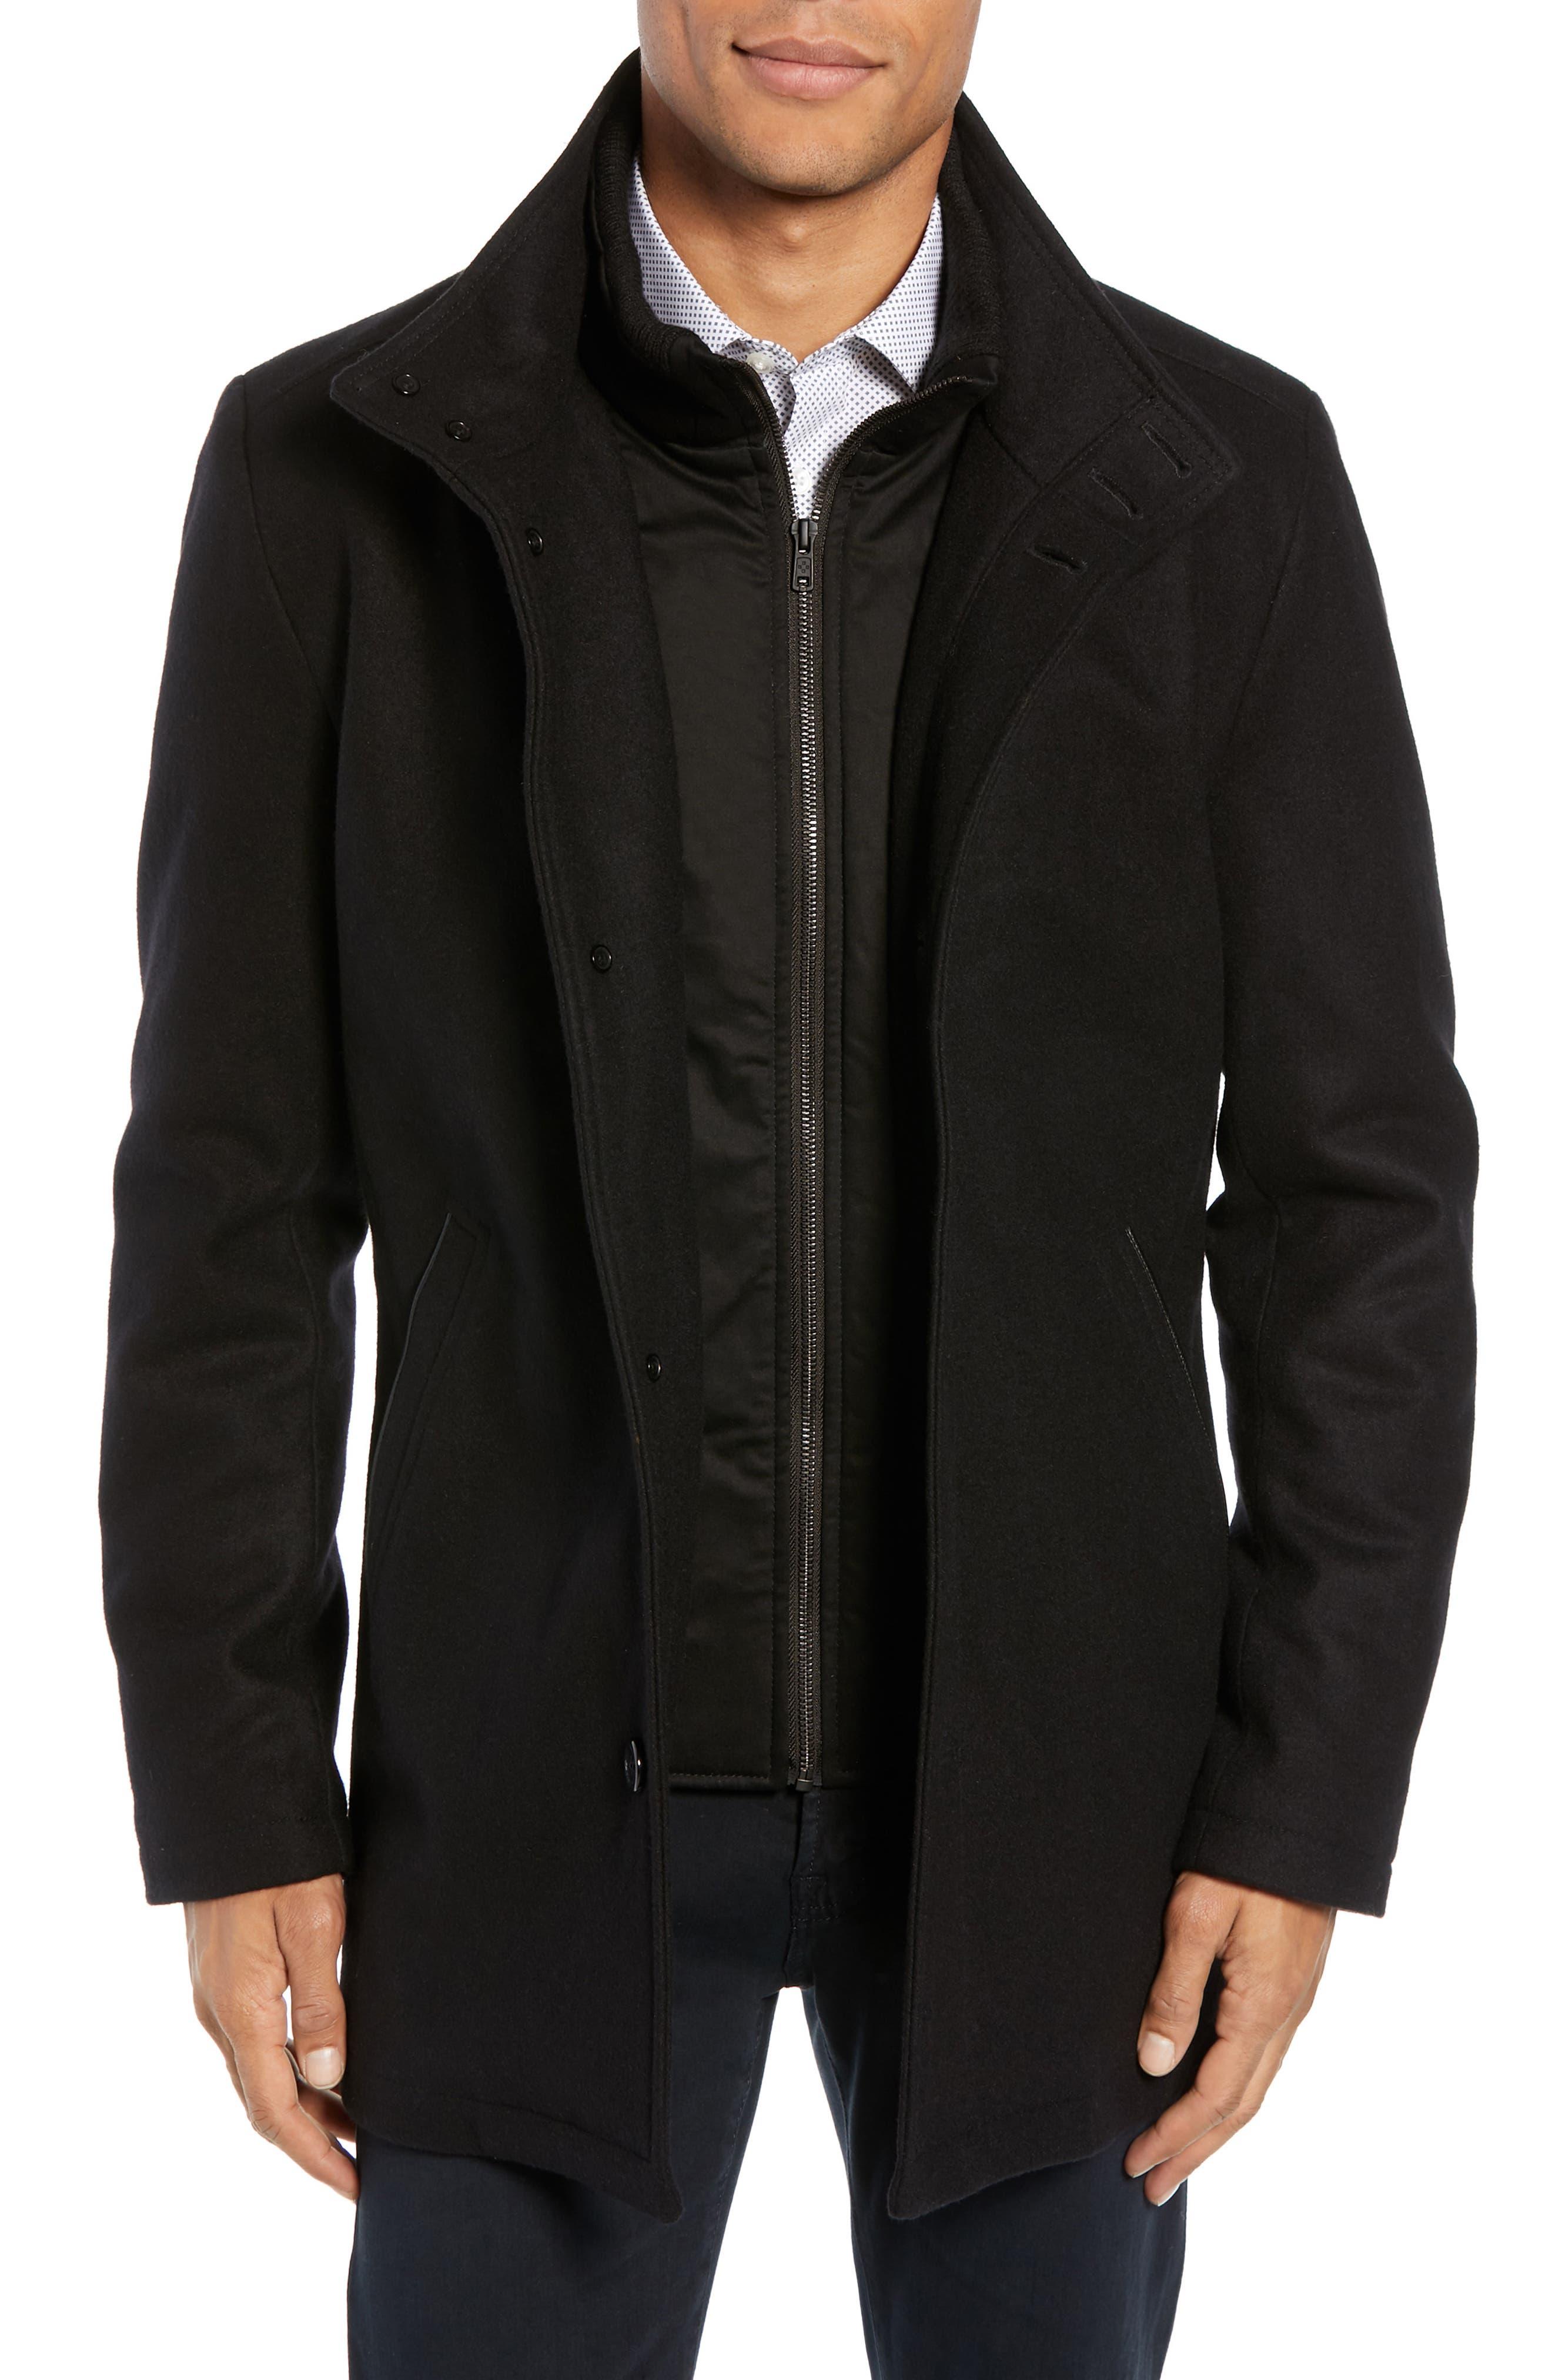 Classic Wool Blend Car Coat with Inset Bib,                             Main thumbnail 1, color,                             BLACK